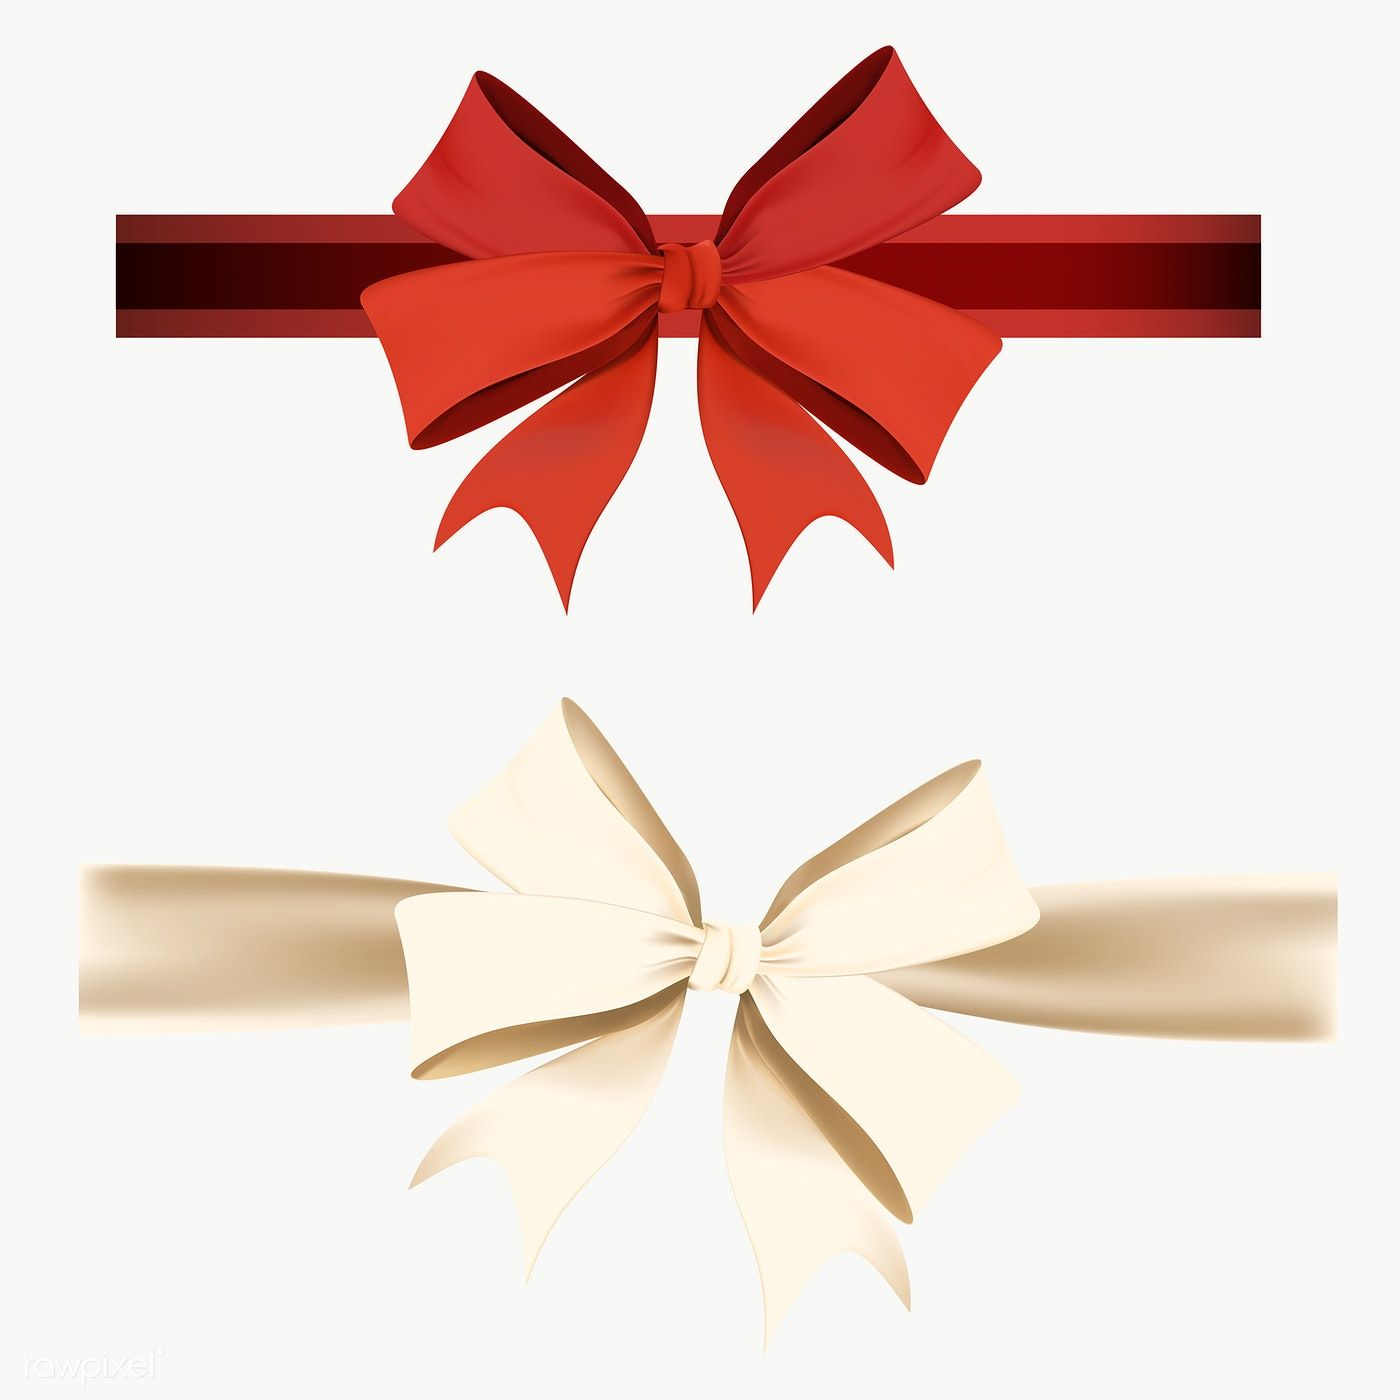 Ribbon Bow Element Set Transparent Png Premium Image By Rawpixel Com Kappy Kappy Ribbon Bows Gift Bows Christmas Ribbon